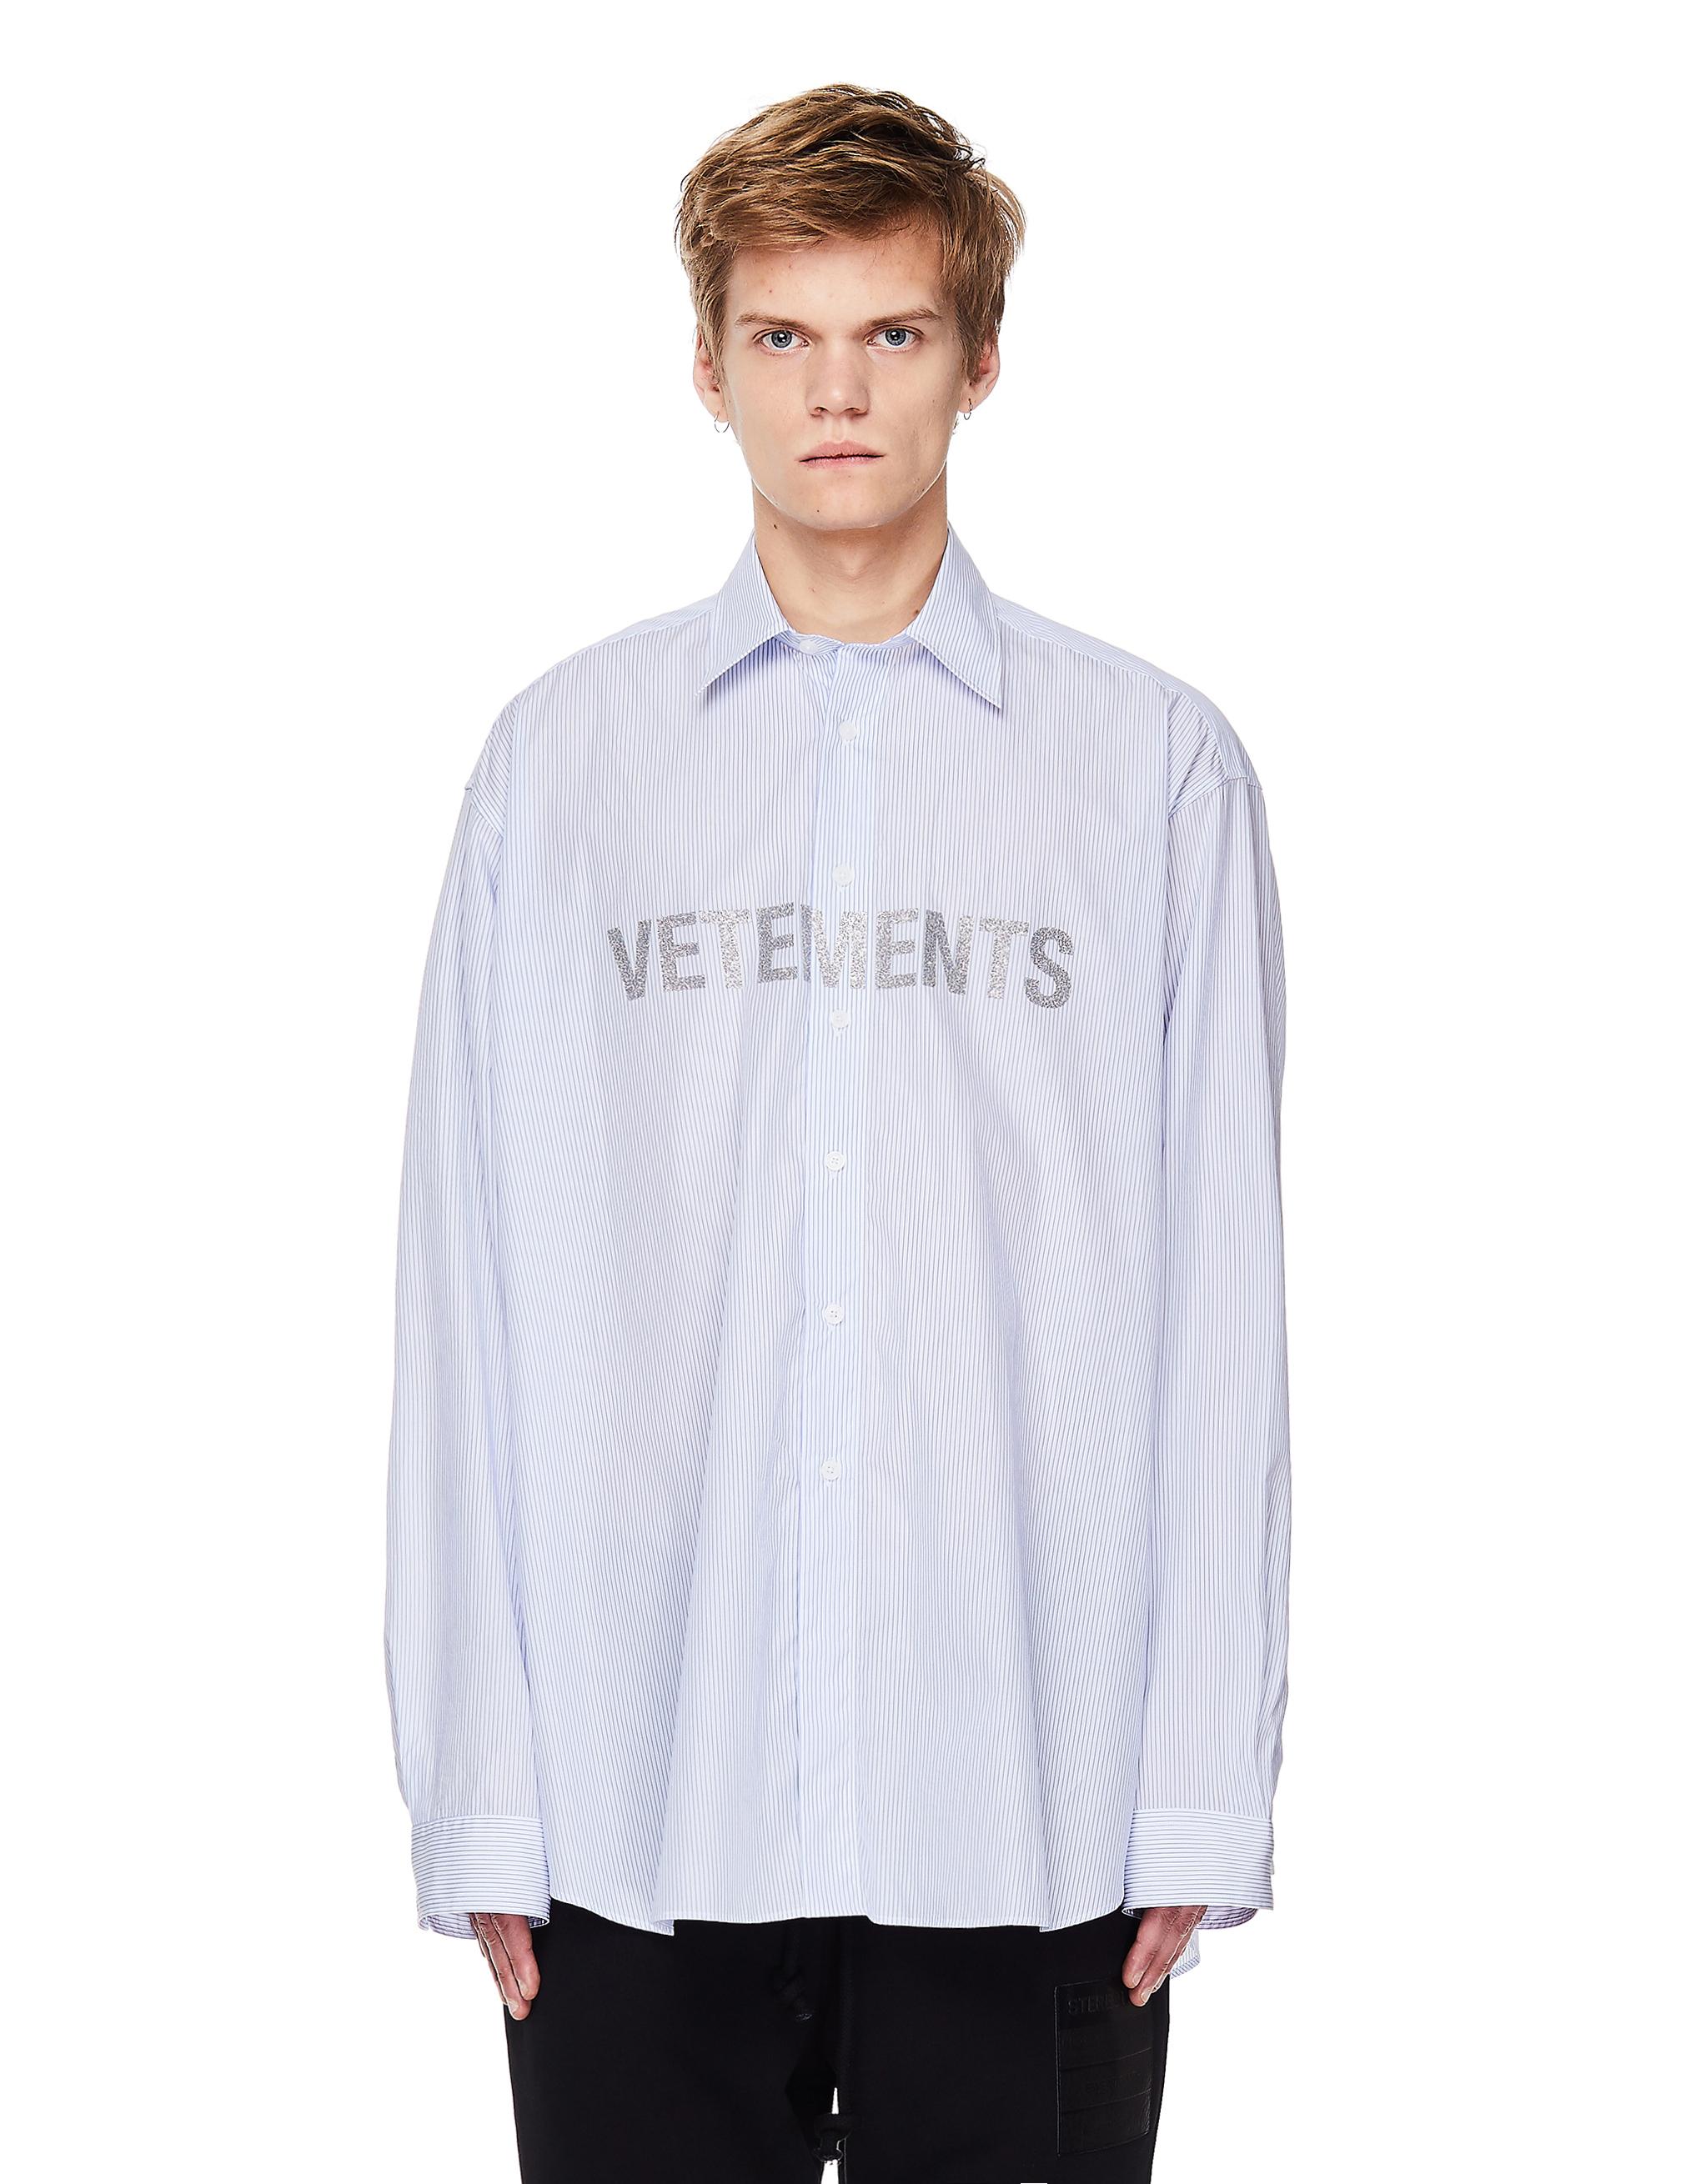 Vetements White Cotton Logo Shirt